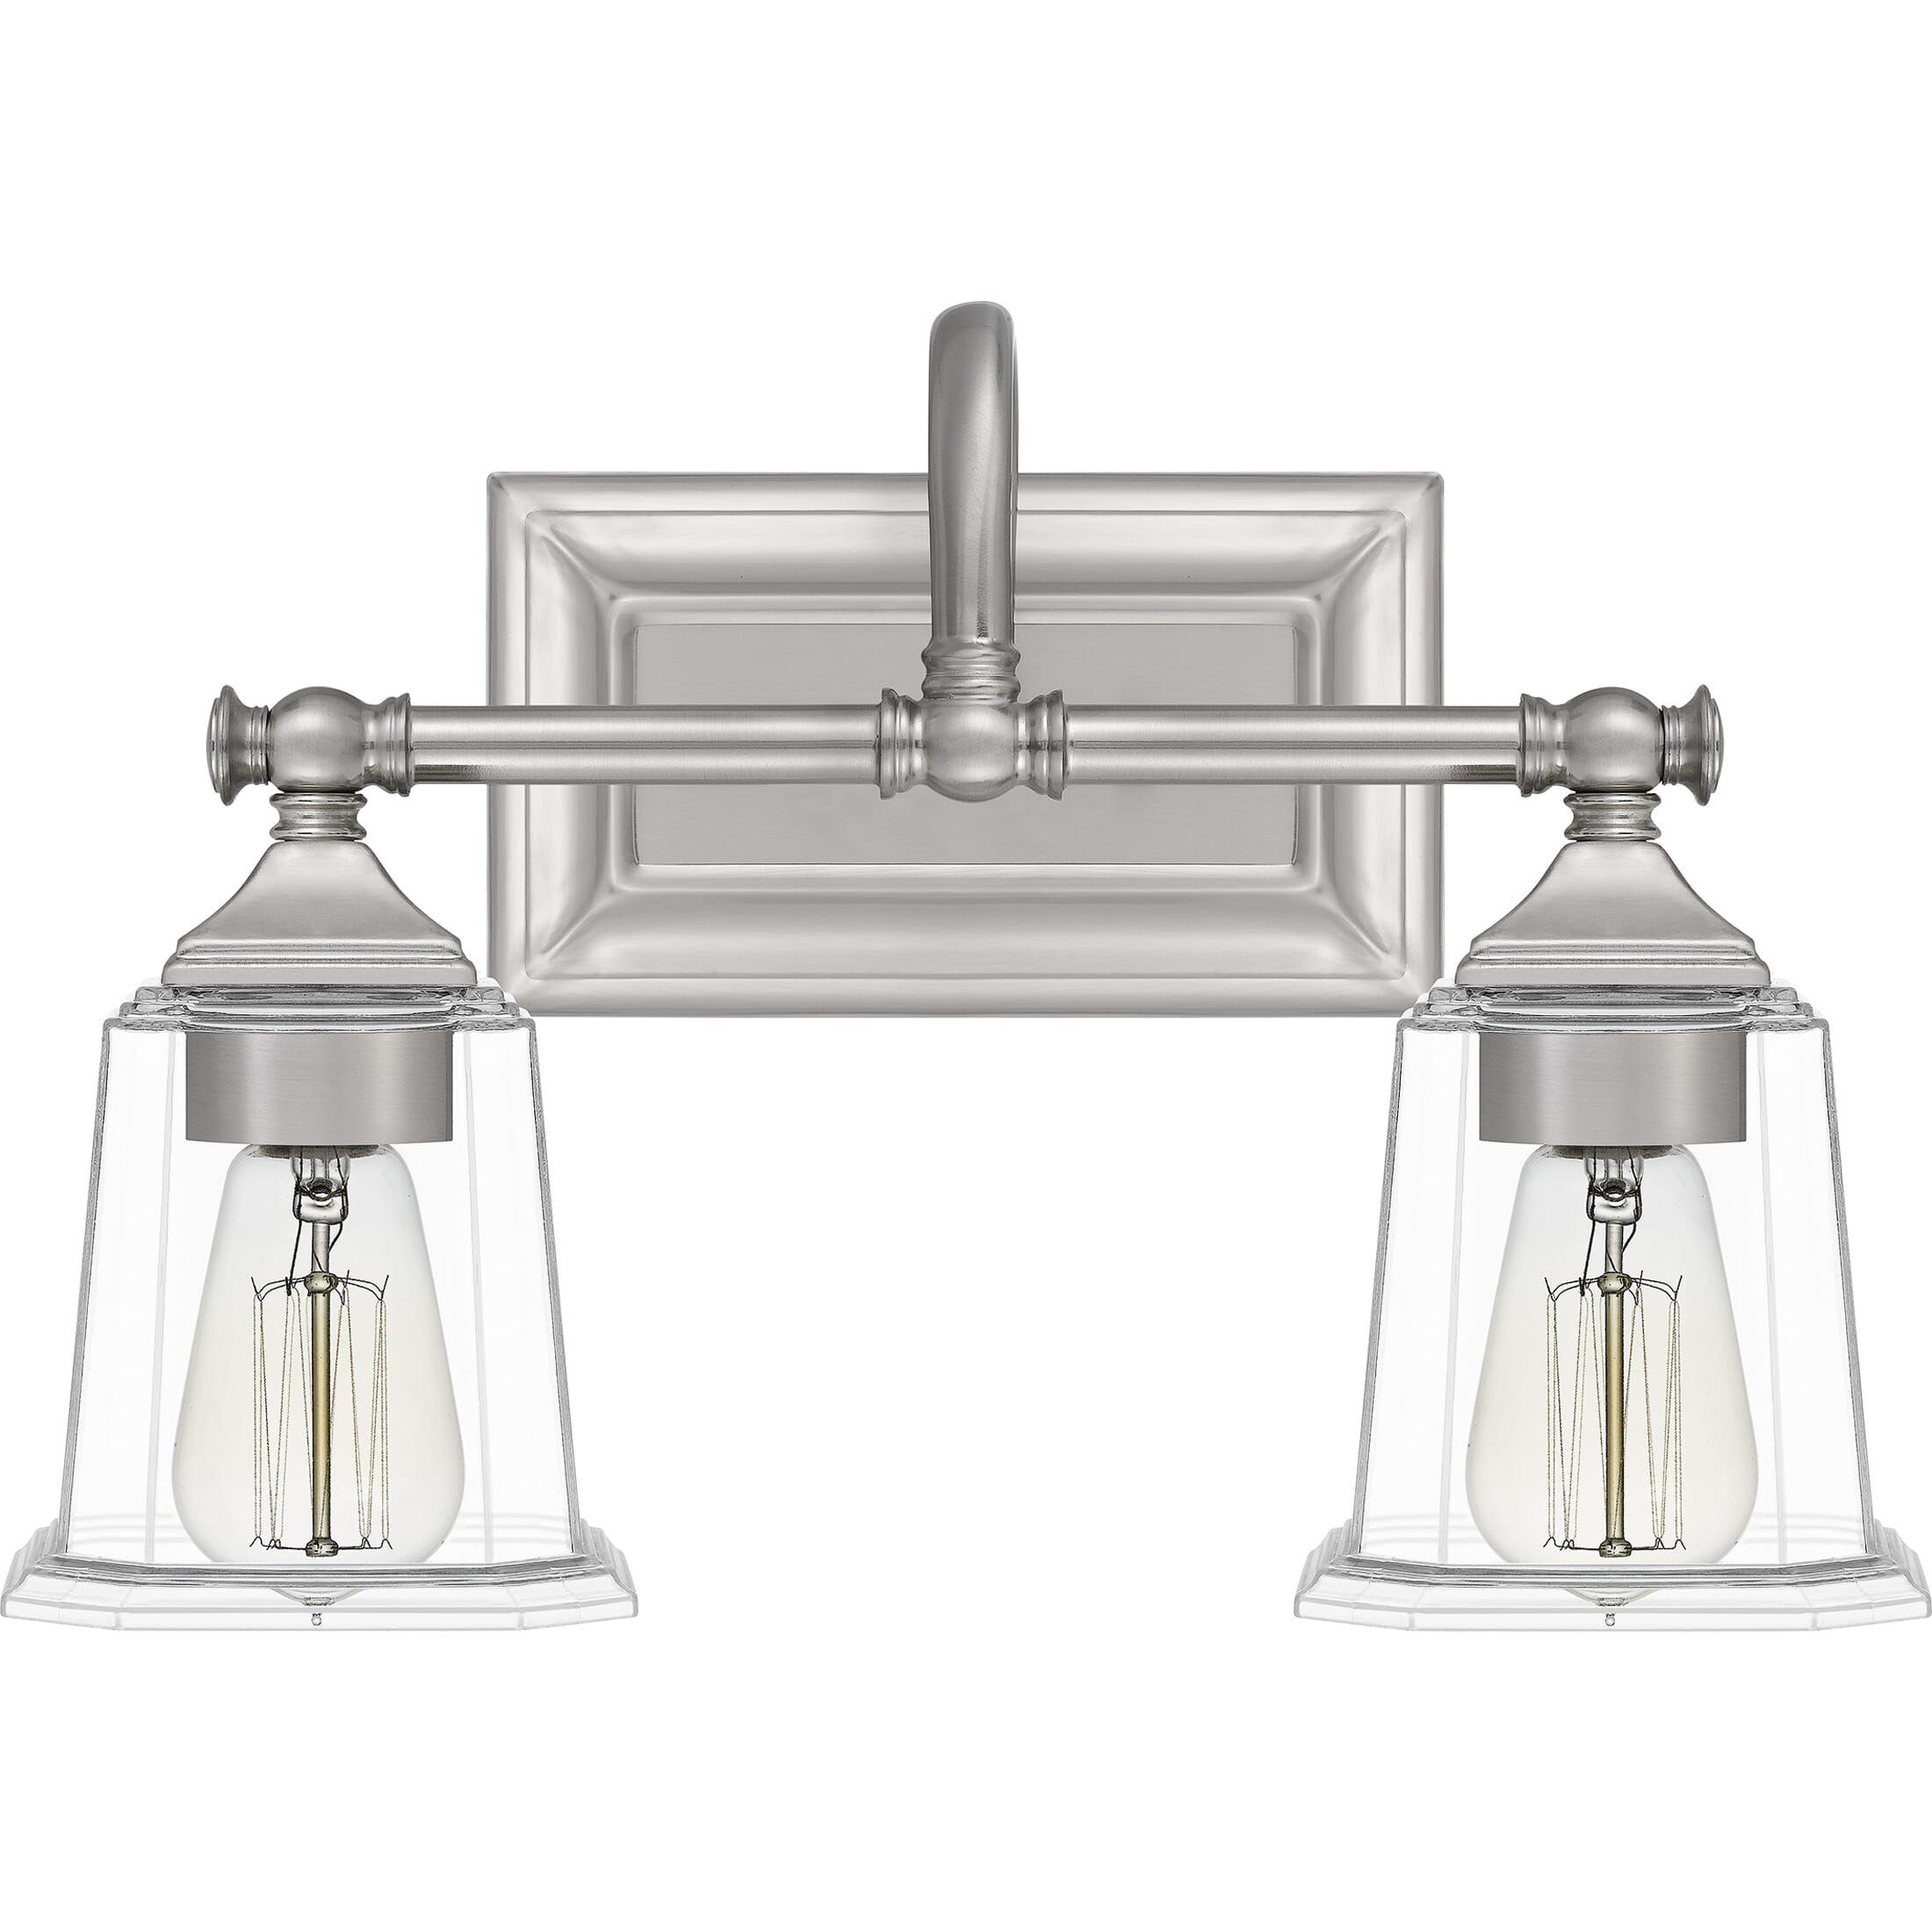 "Photo of Quoizel Nicholas 2-Light 15 ""bathroom vanity lamp made of brushed nickel"